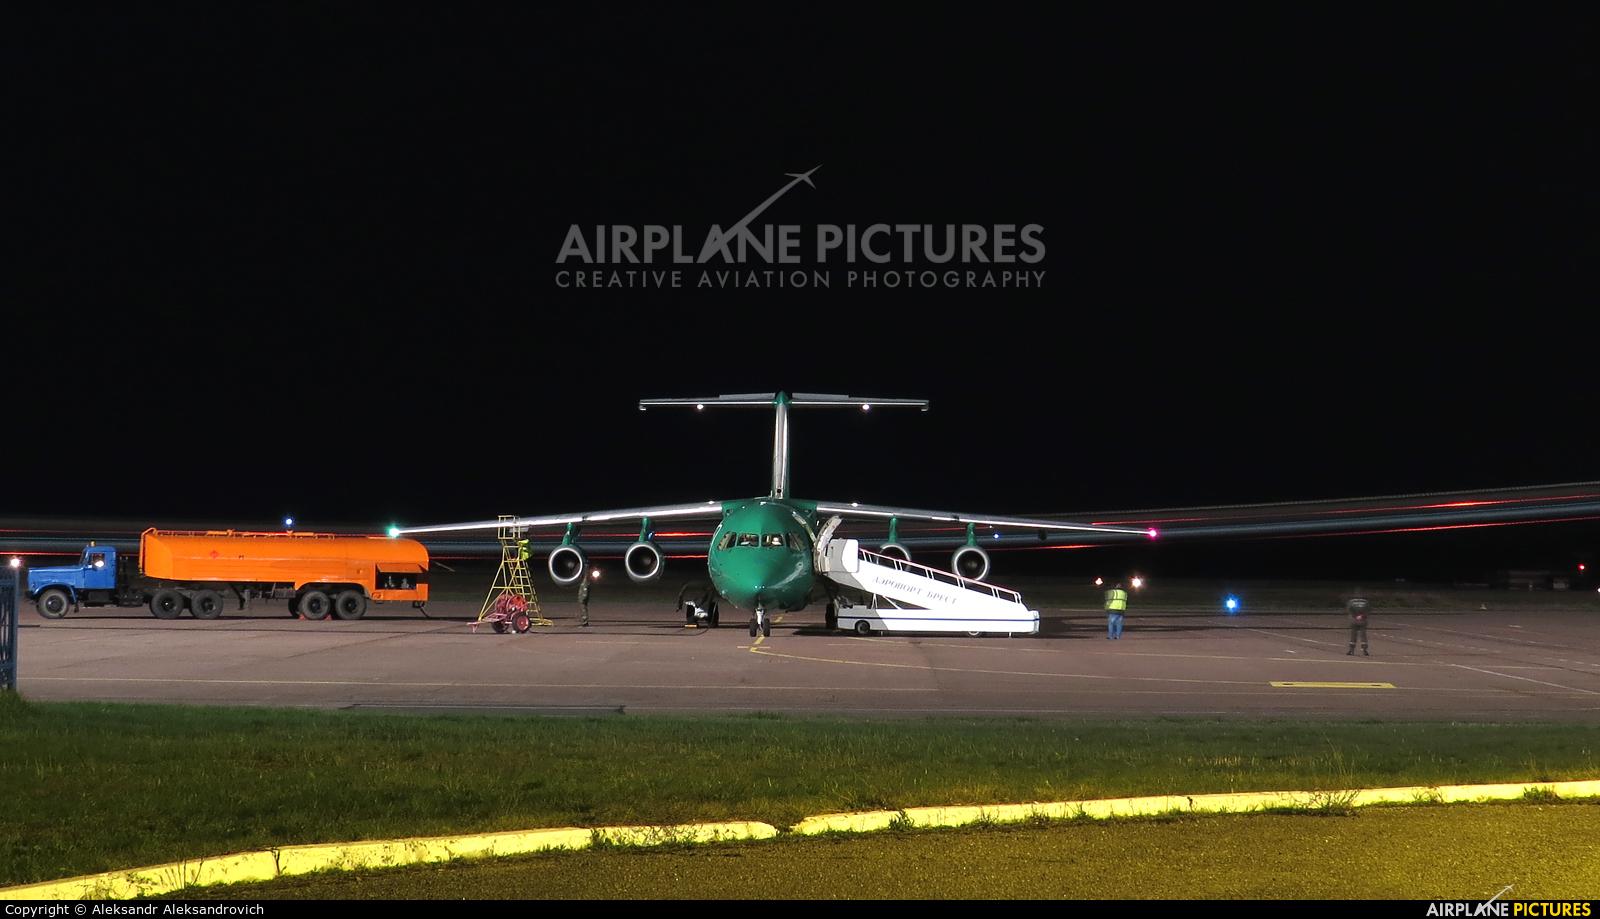 Aviro Air YR-AVR aircraft at Brest Airport